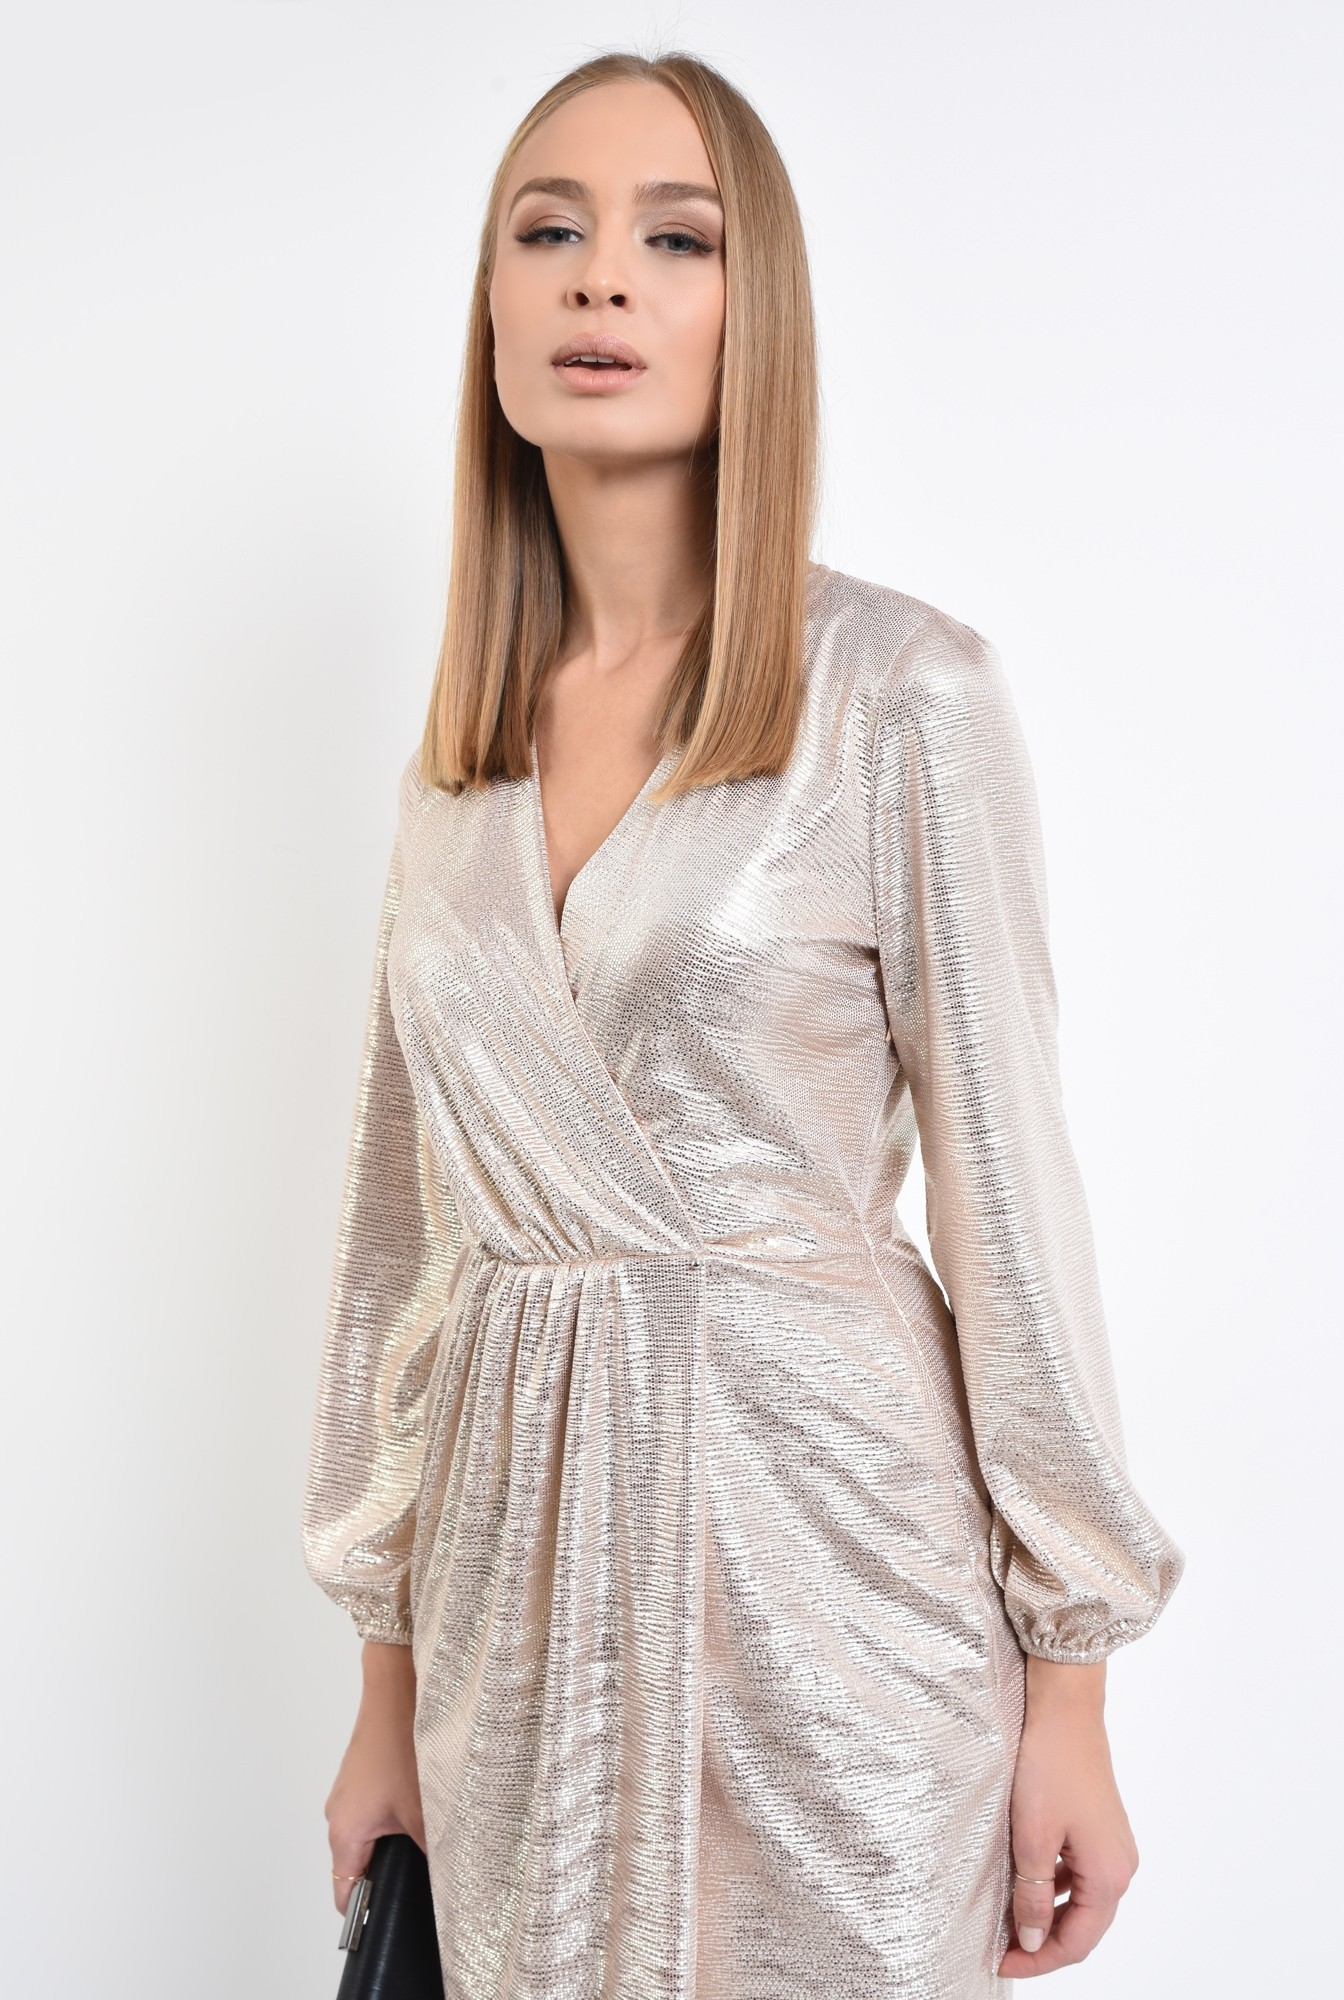 2 - rochie de ocazie, din lurex auriu, anchior, parte peste parte